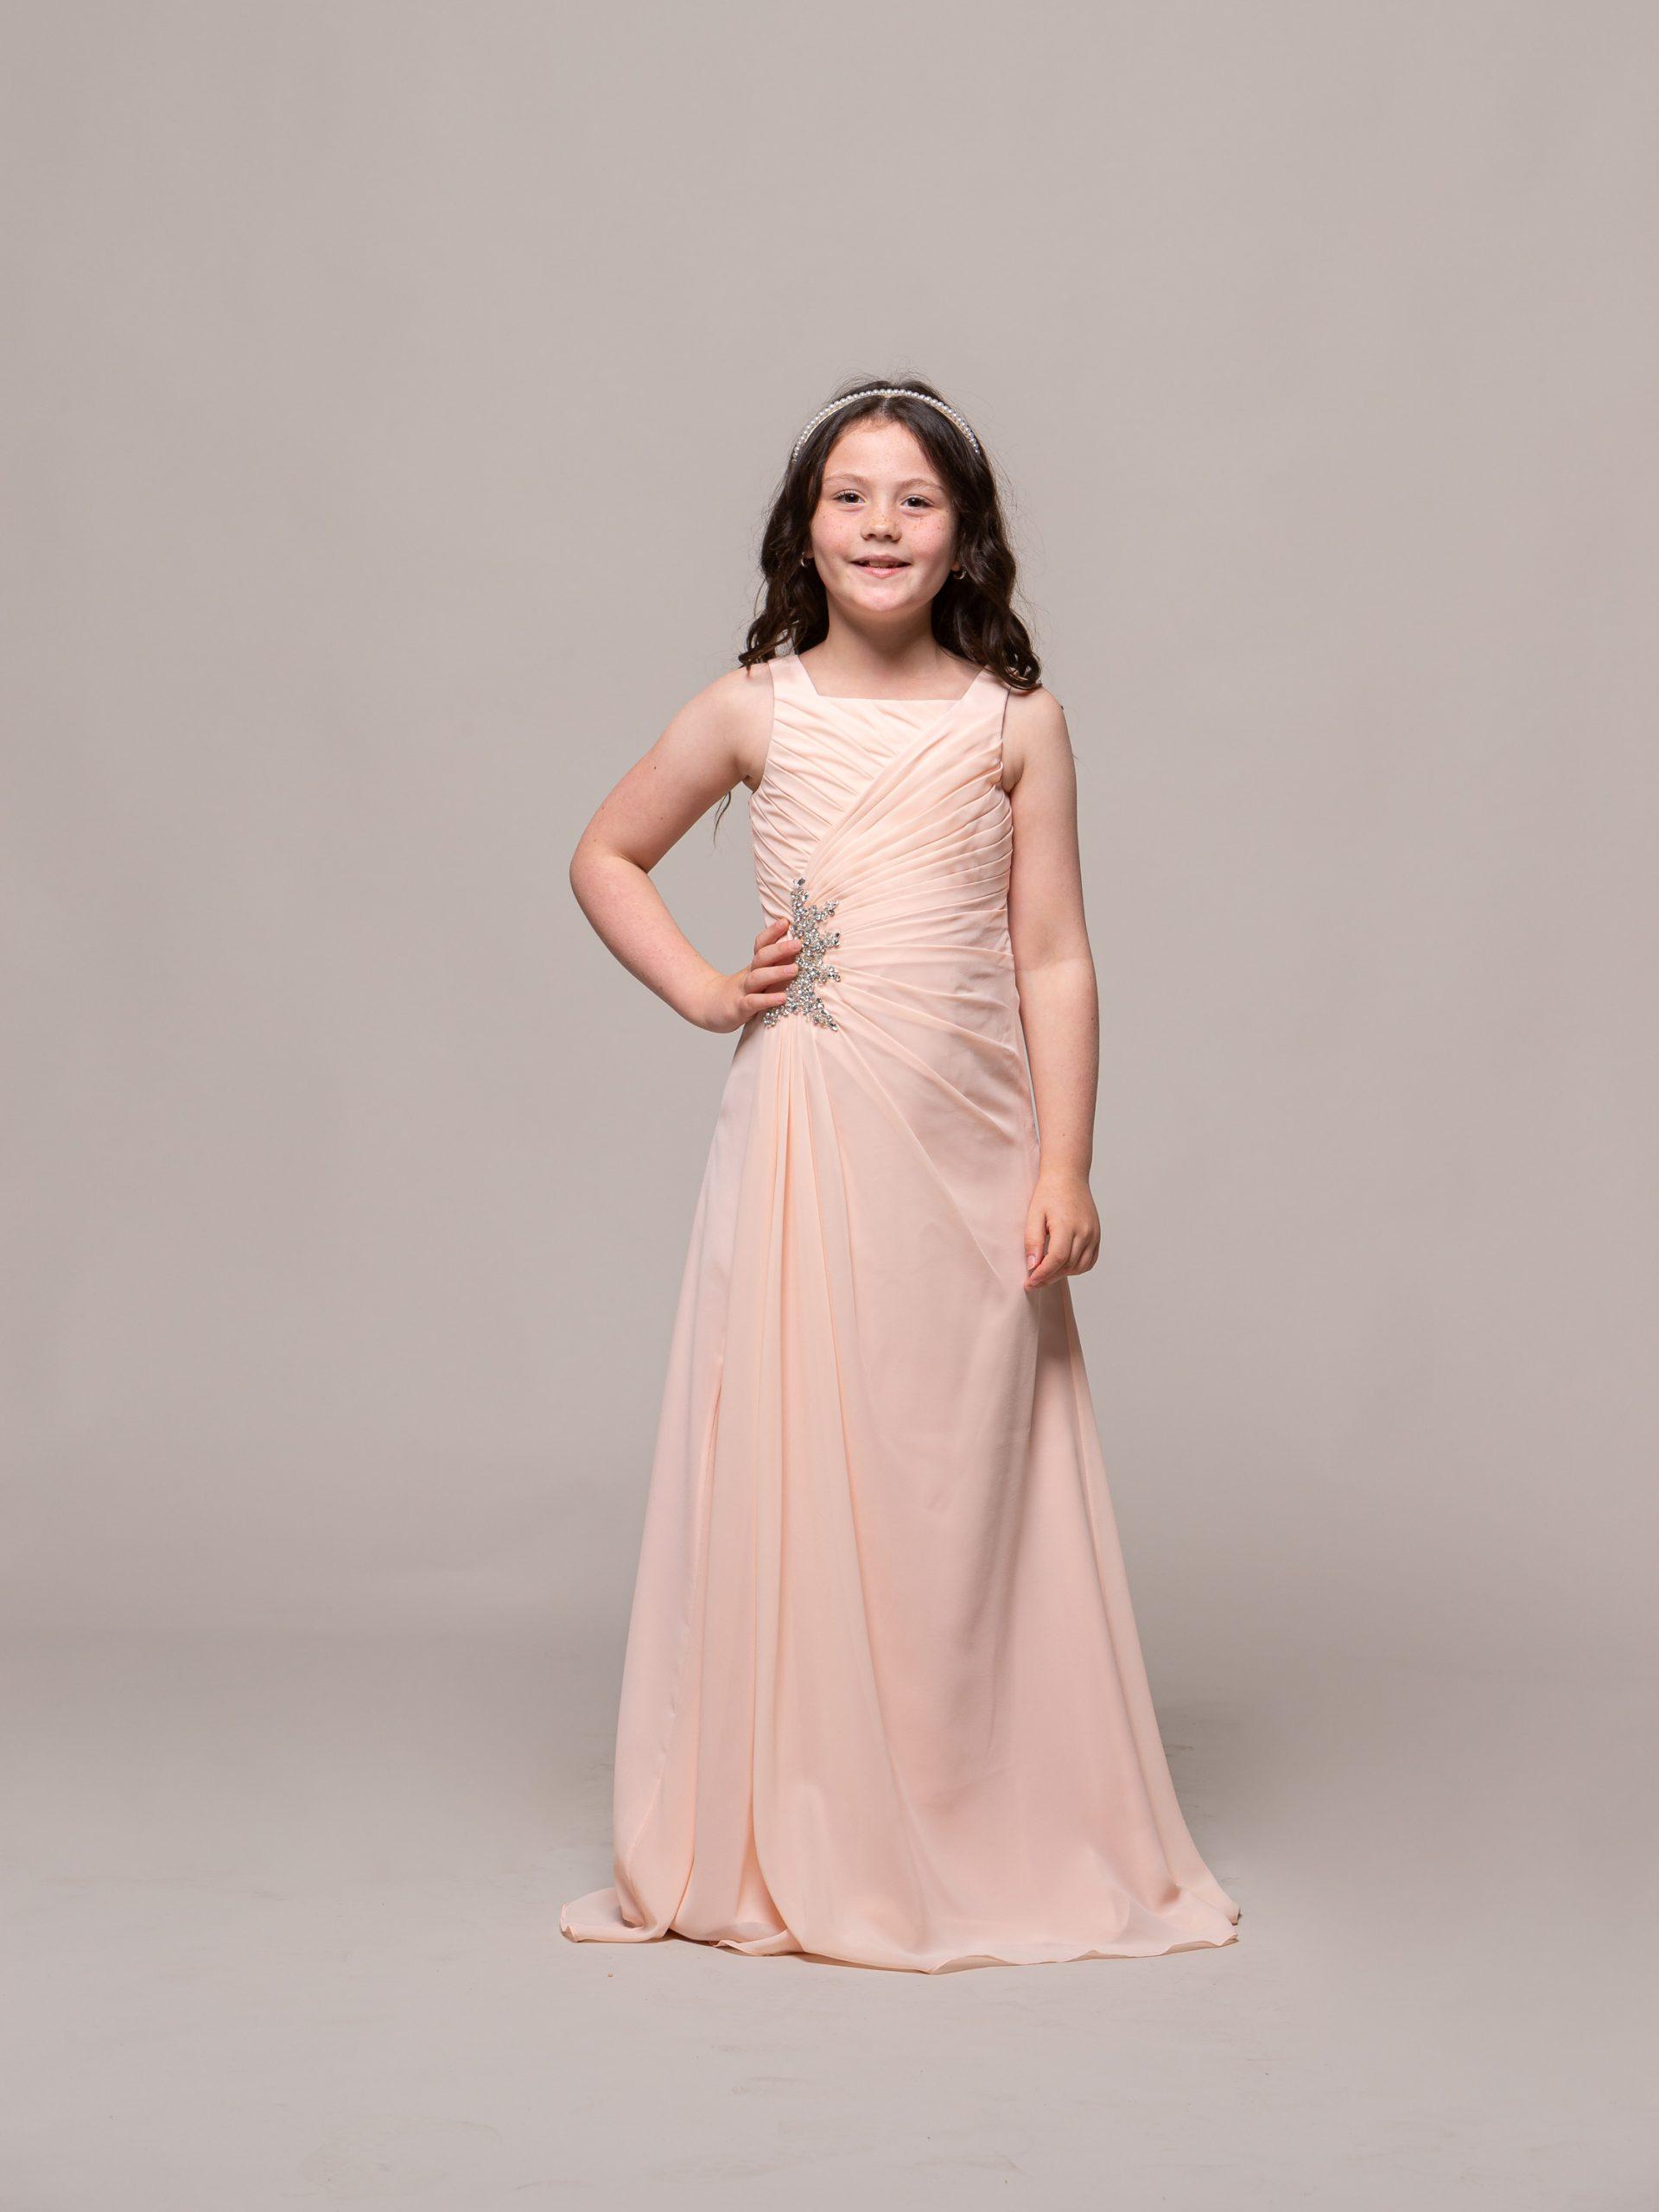 MAB05JNC03 19-4462 - MAB 05 JN Ivory-.Junior bridesmaid in blush 1